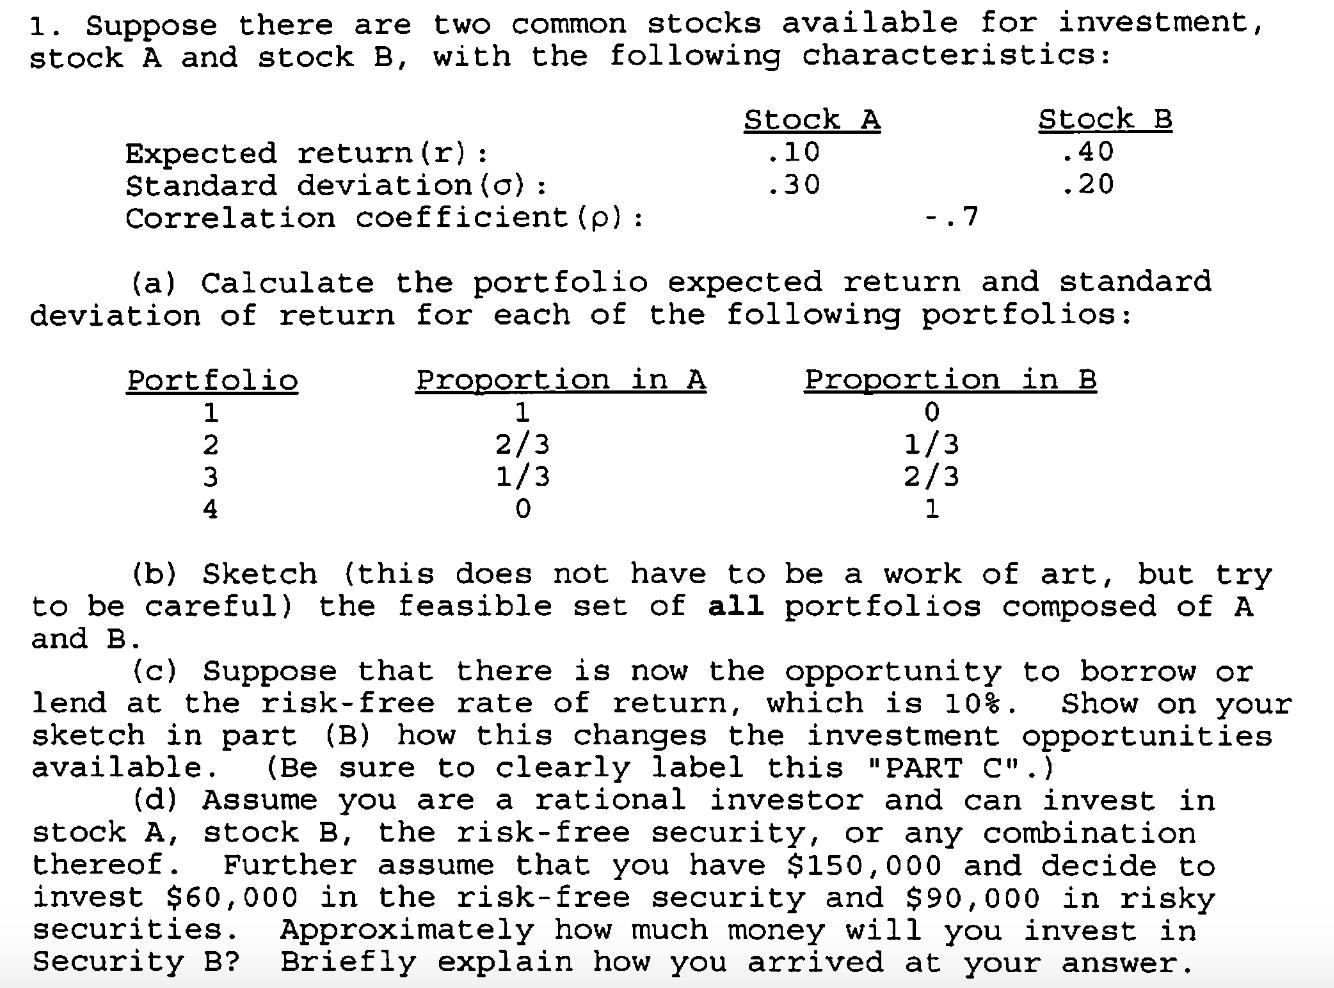 Finance homework help bonds beta expected returns